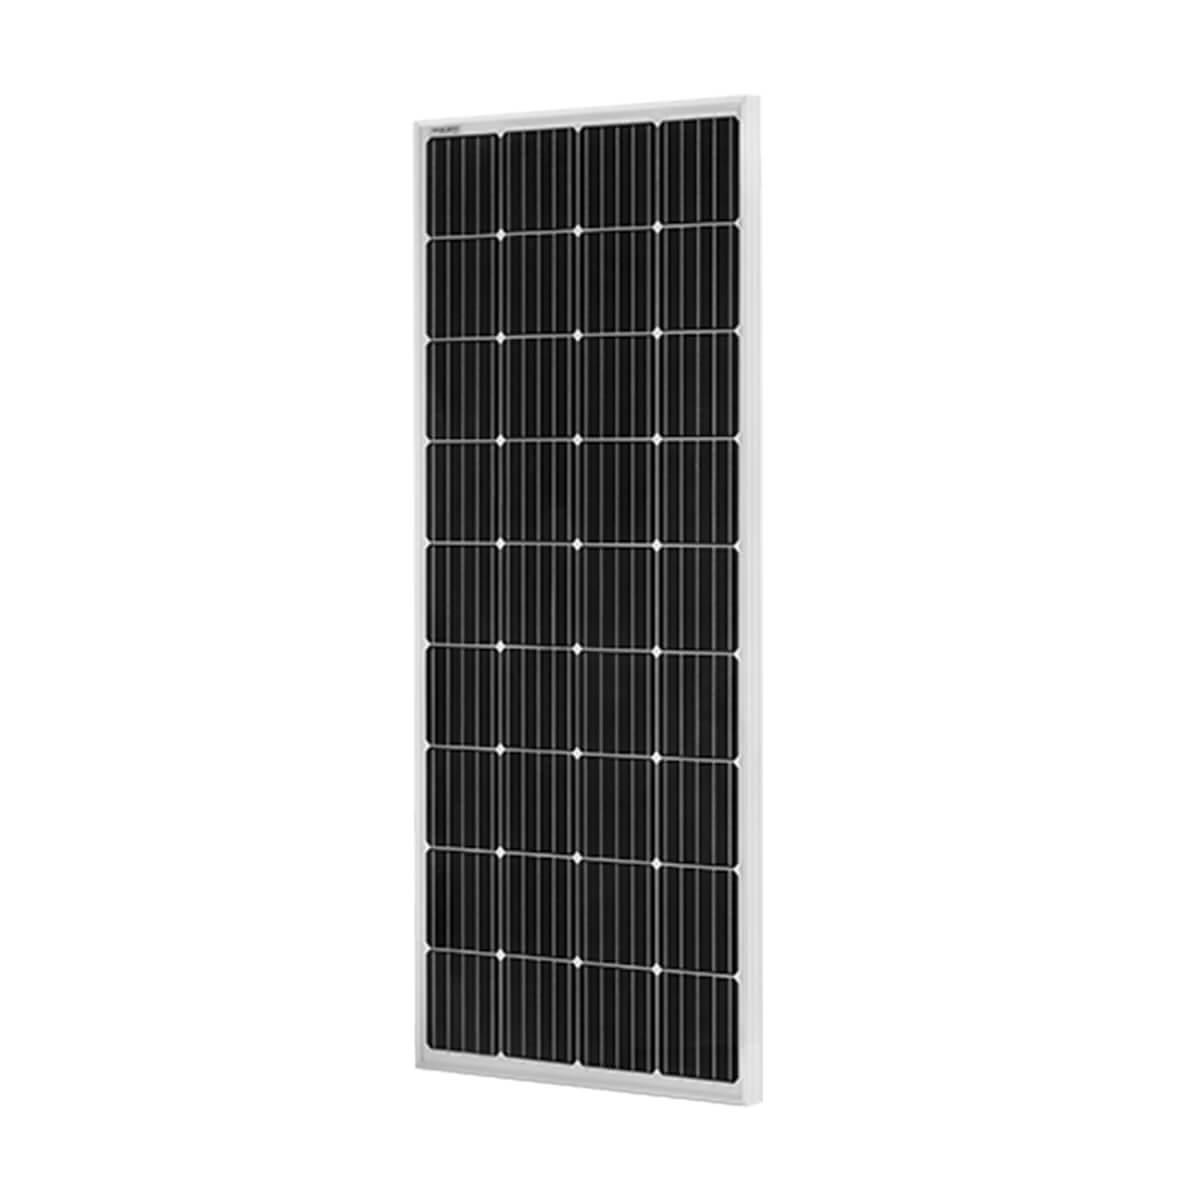 Odul solar 185W panel, odul solar 185Watt panel, Odul solar 185 W panel, odul solar 185 Watt panel, odul solar 185 Watt monokristal panel, Odul solar 185 W watt gunes paneli, odul solar 185 W watt monokristal gunes paneli, odul solar 185 W Watt fotovoltaik monokristal solar panel, odul solar 185W monokristal gunes enerjisi, odul solar OSP-185W panel, ÖDÜL SOLAR 185 WATT